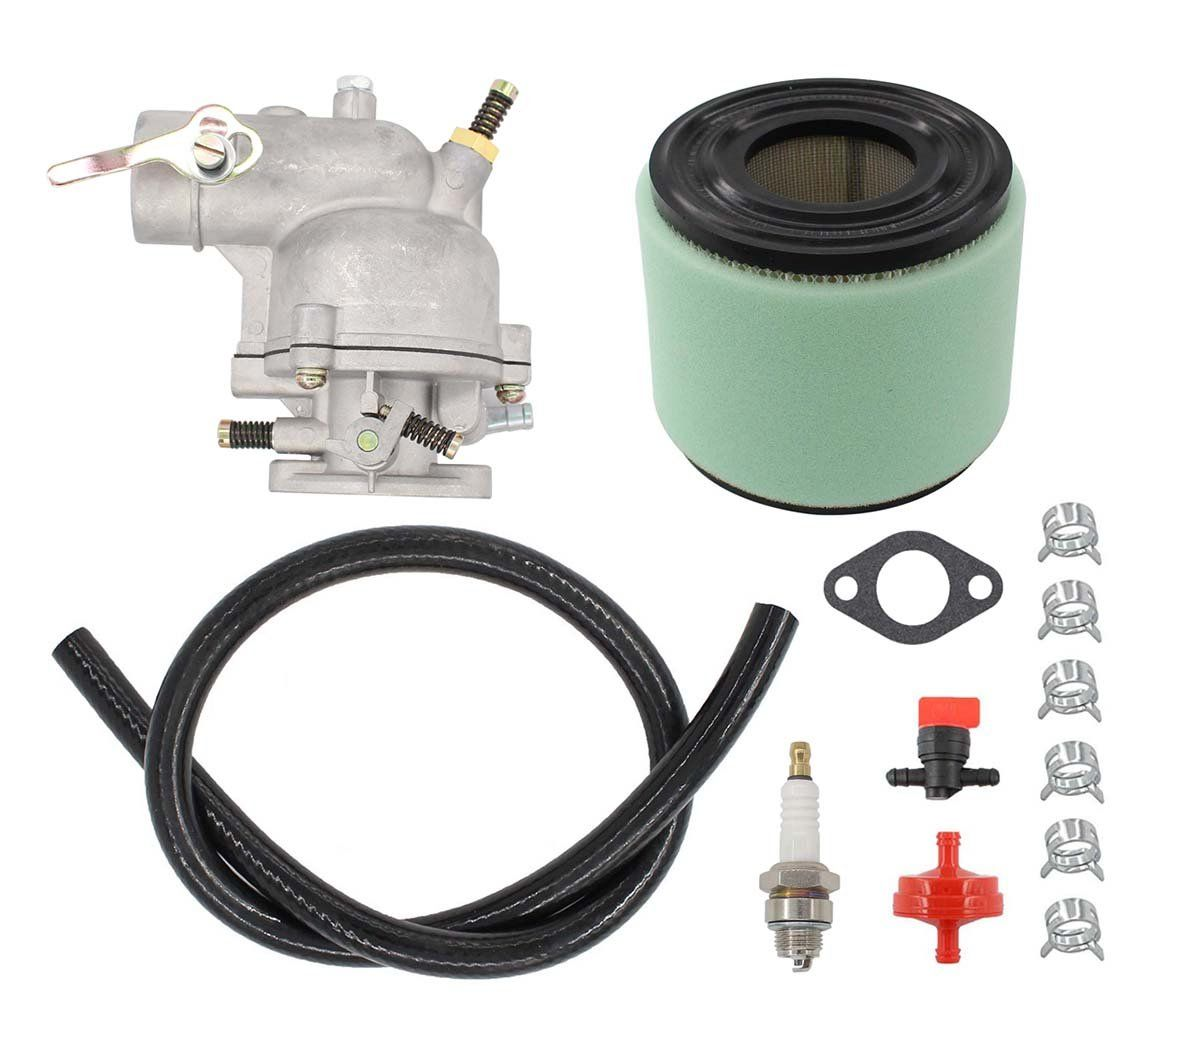 hight resolution of carburetor air filter fuel hose shut off valve for briggs and stratton 390323 394228 299169 7